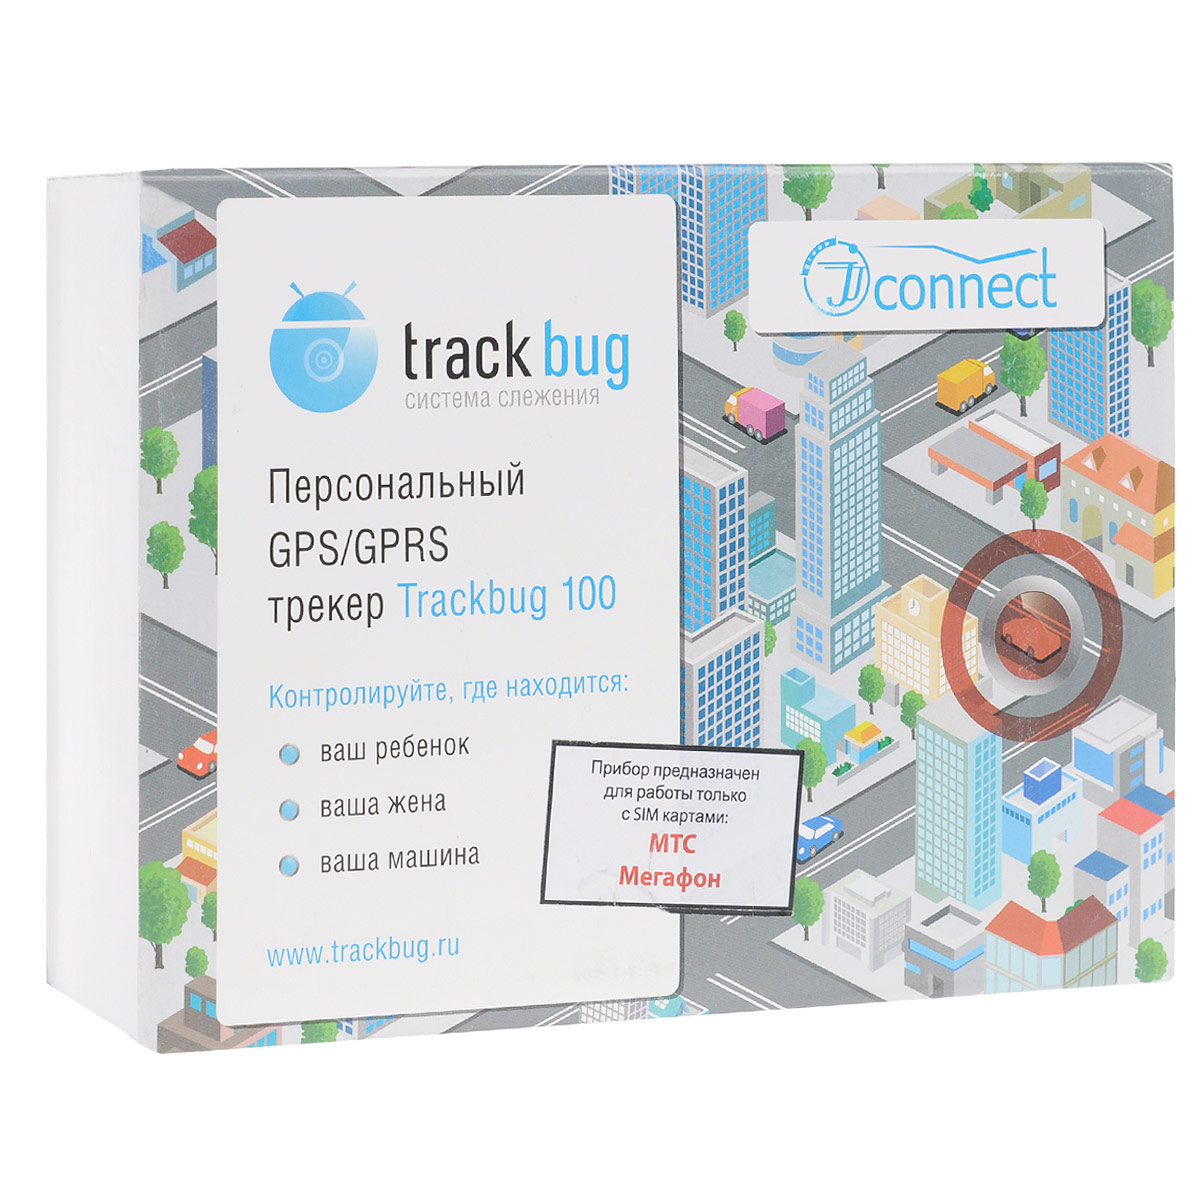 Трекер JJ-Connect Track Bug 100 GPS/GPRS - Туристические GPS-навигаторы